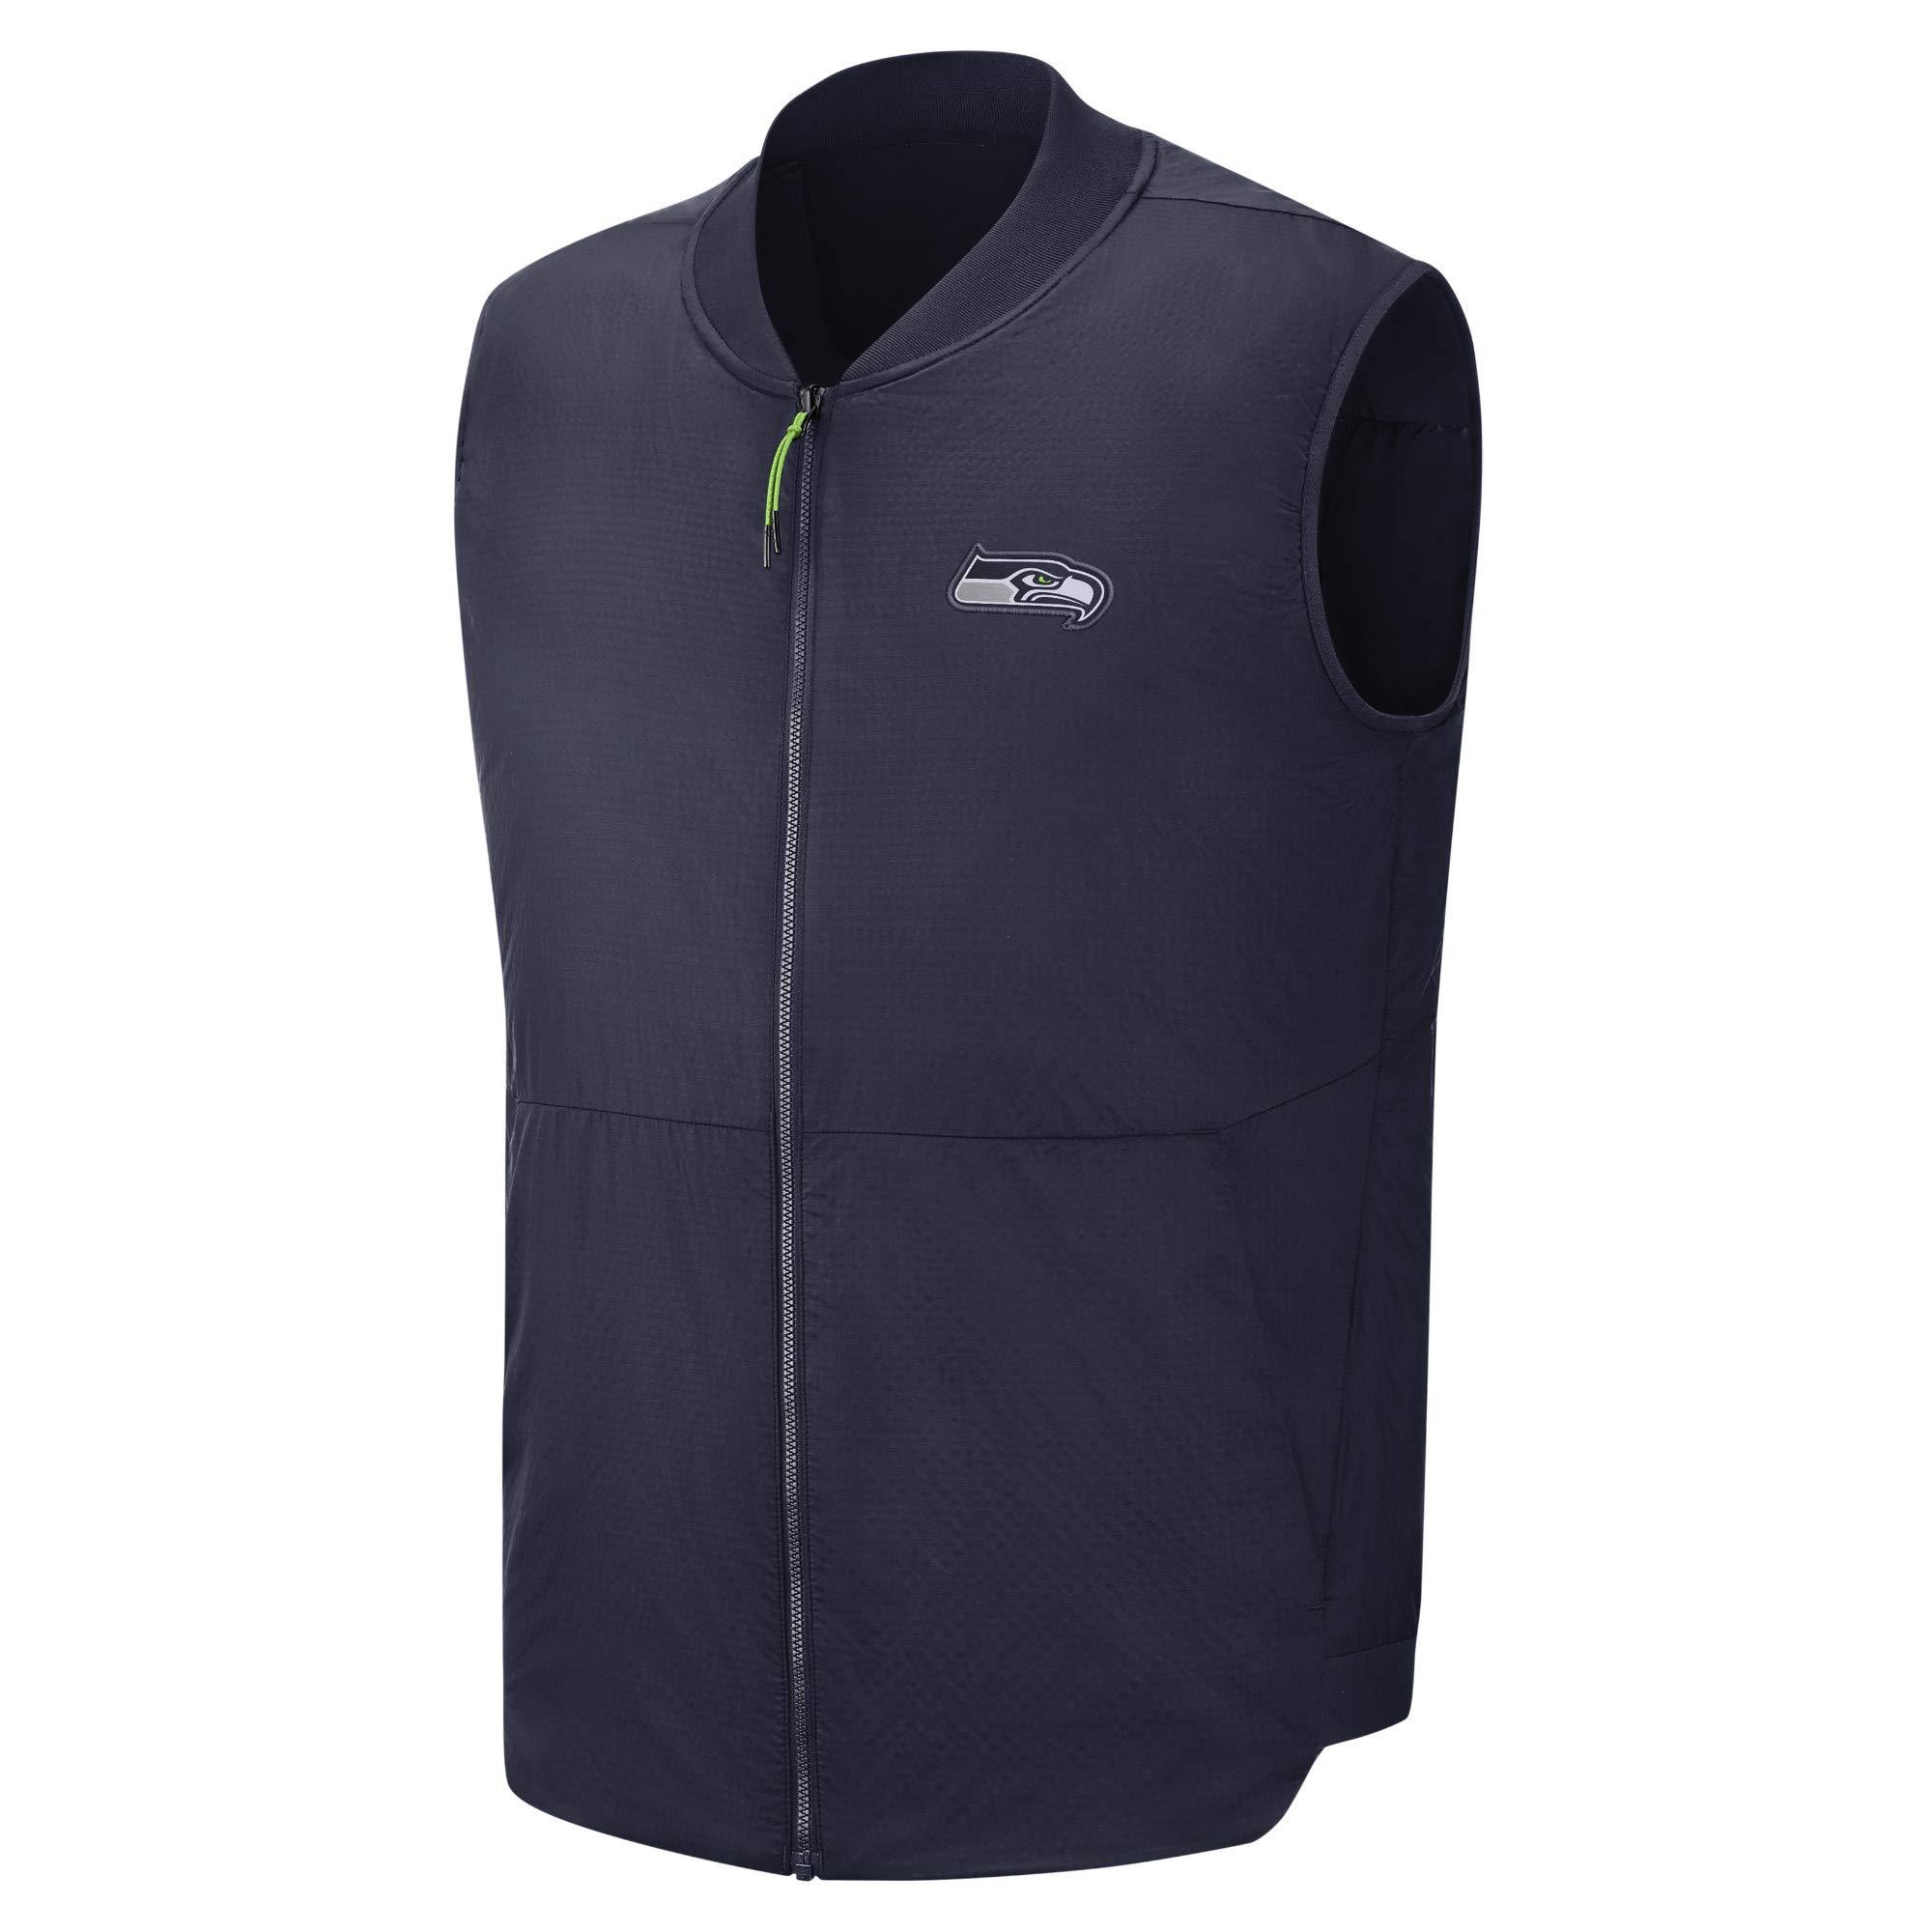 Nike NFL Seattle Seahawks Men's Vest (College Navy/Action Green, Medium)